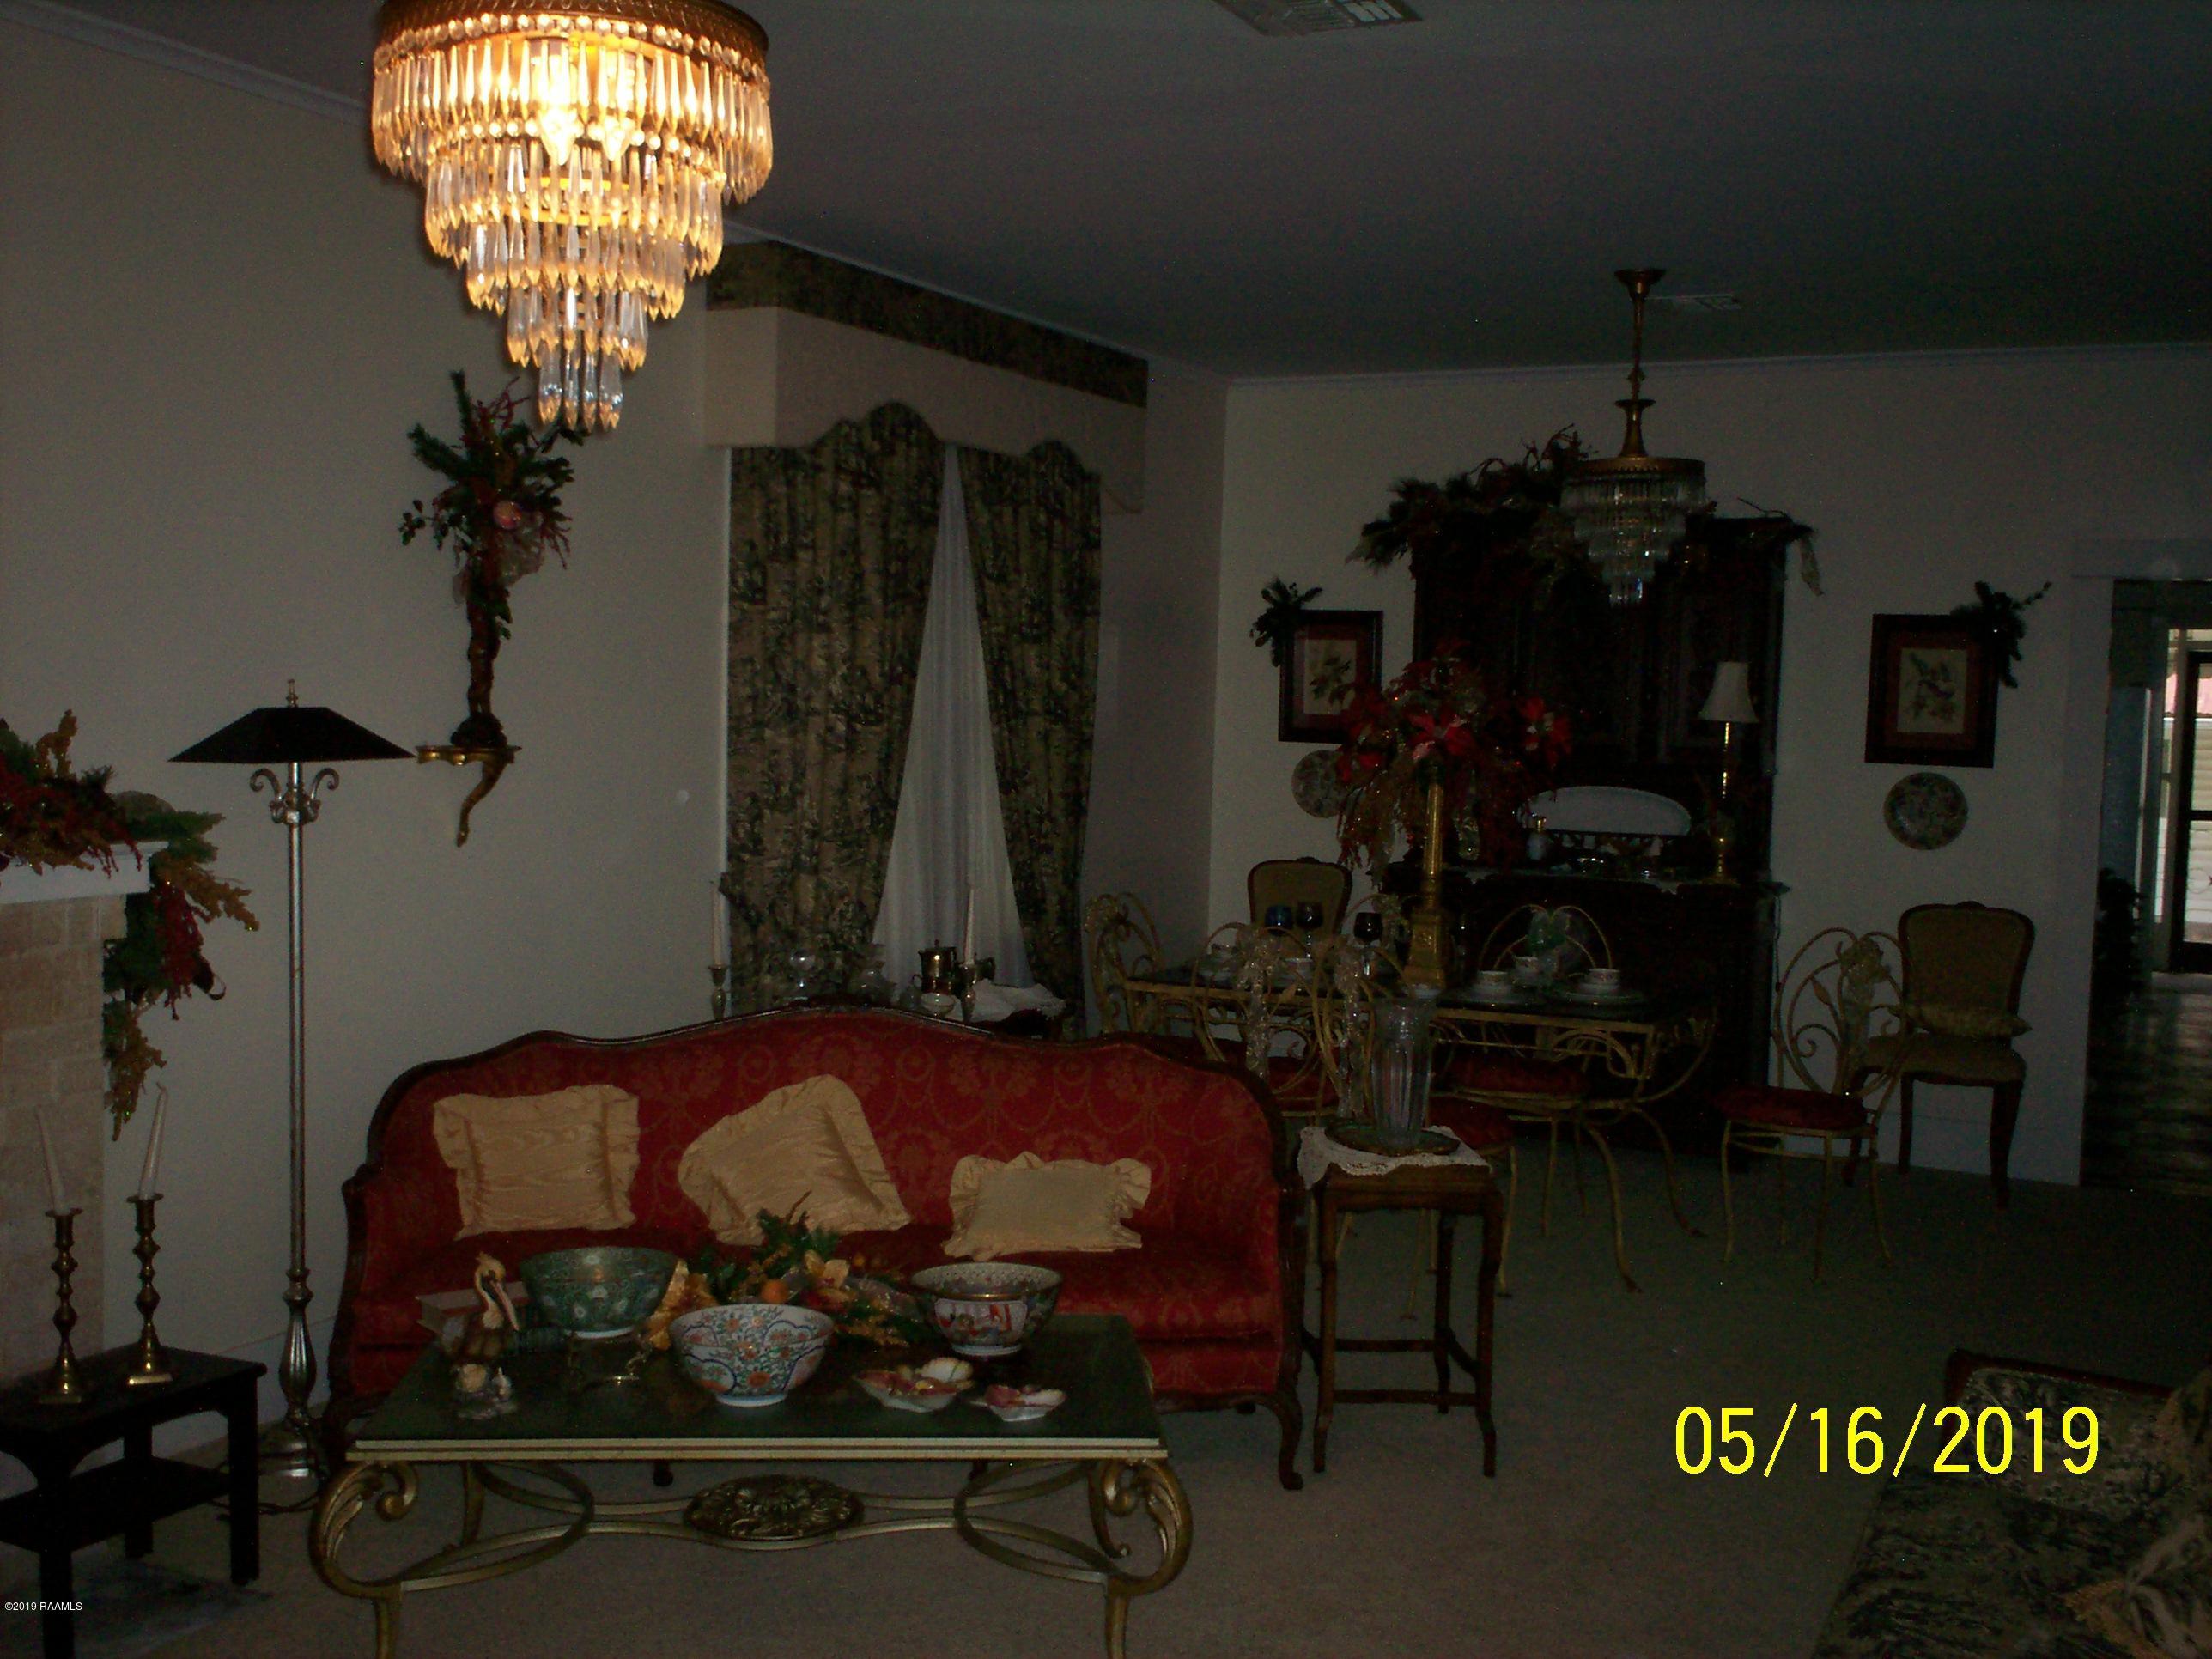 212 Washington Street, St. Martinville, LA 70582 Photo #3